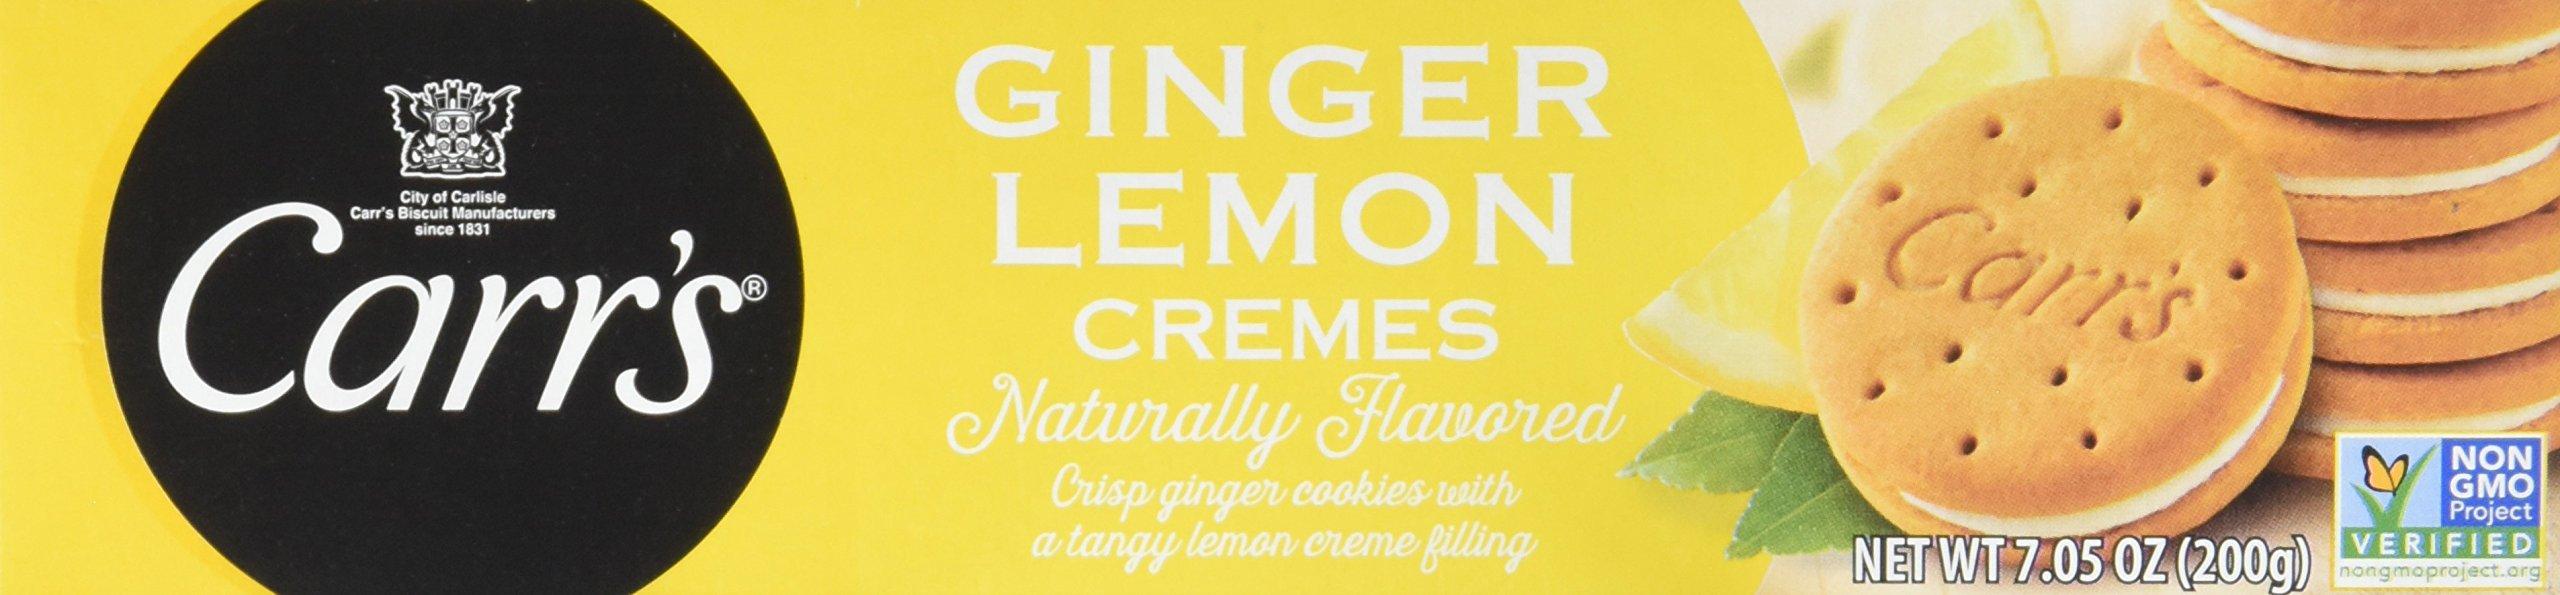 Carr's Ginger Lemon Crèmes Cookies, 7.05 oz(Pack of 8)